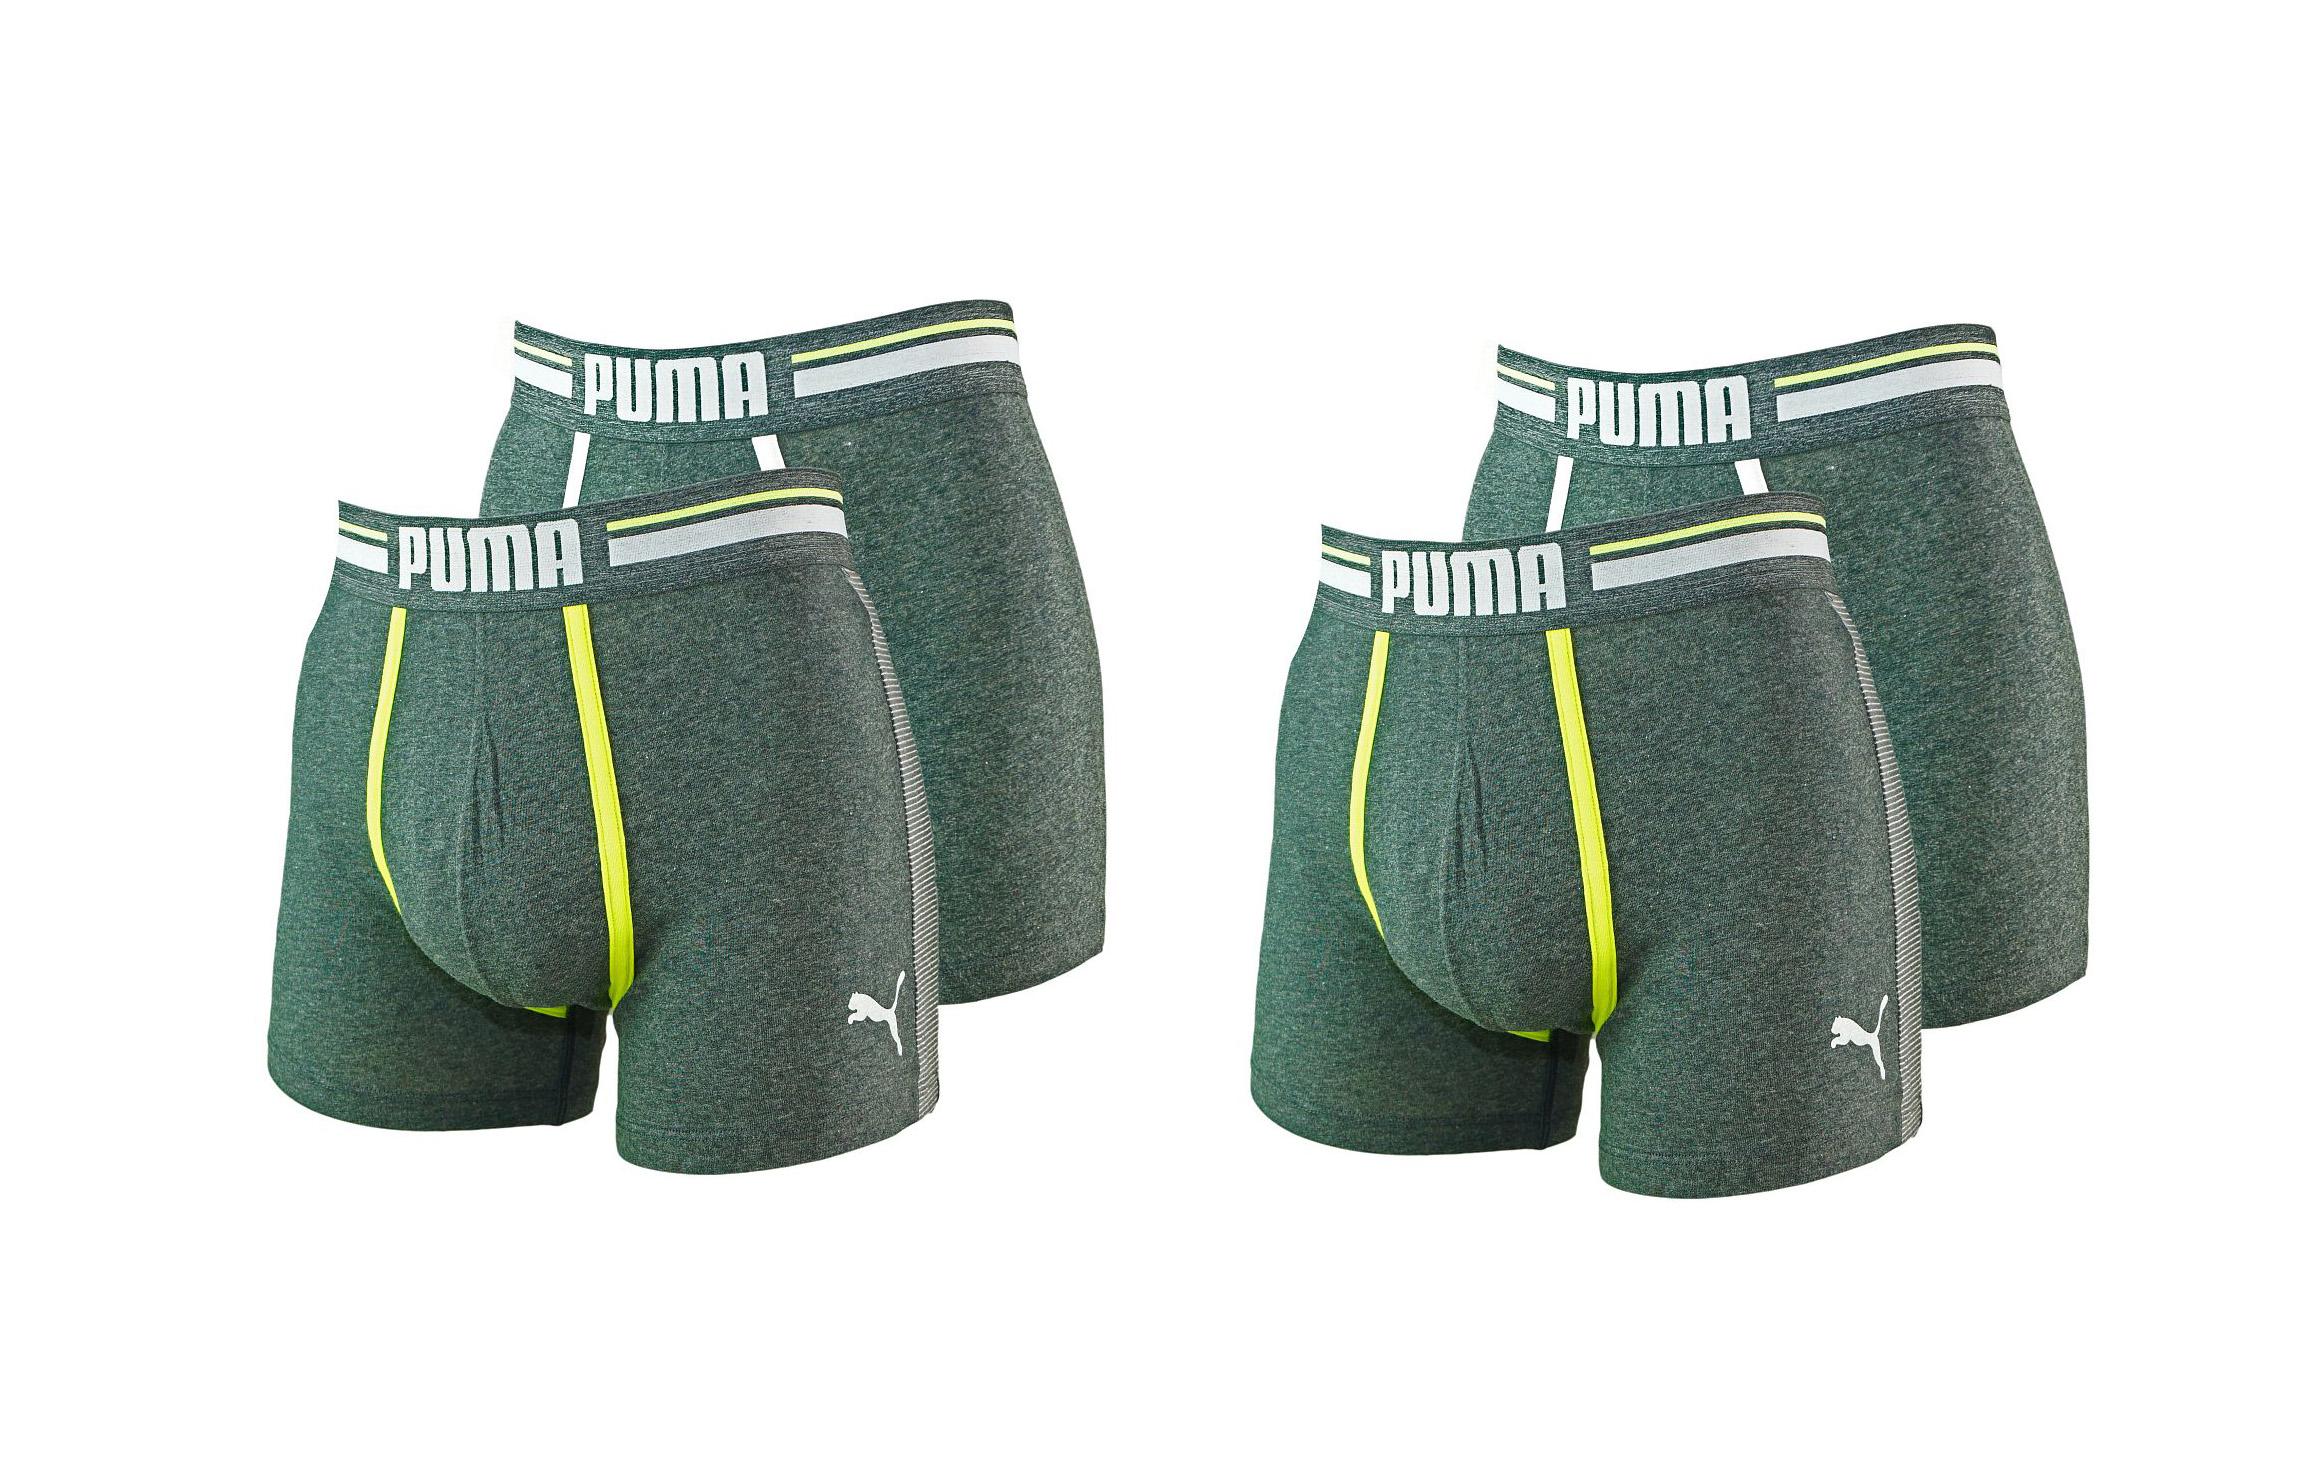 PUMA Shorts Unterhosen 2 x 2er Pack Boxer 571005001 962 020 asphalt SF17-PMS2